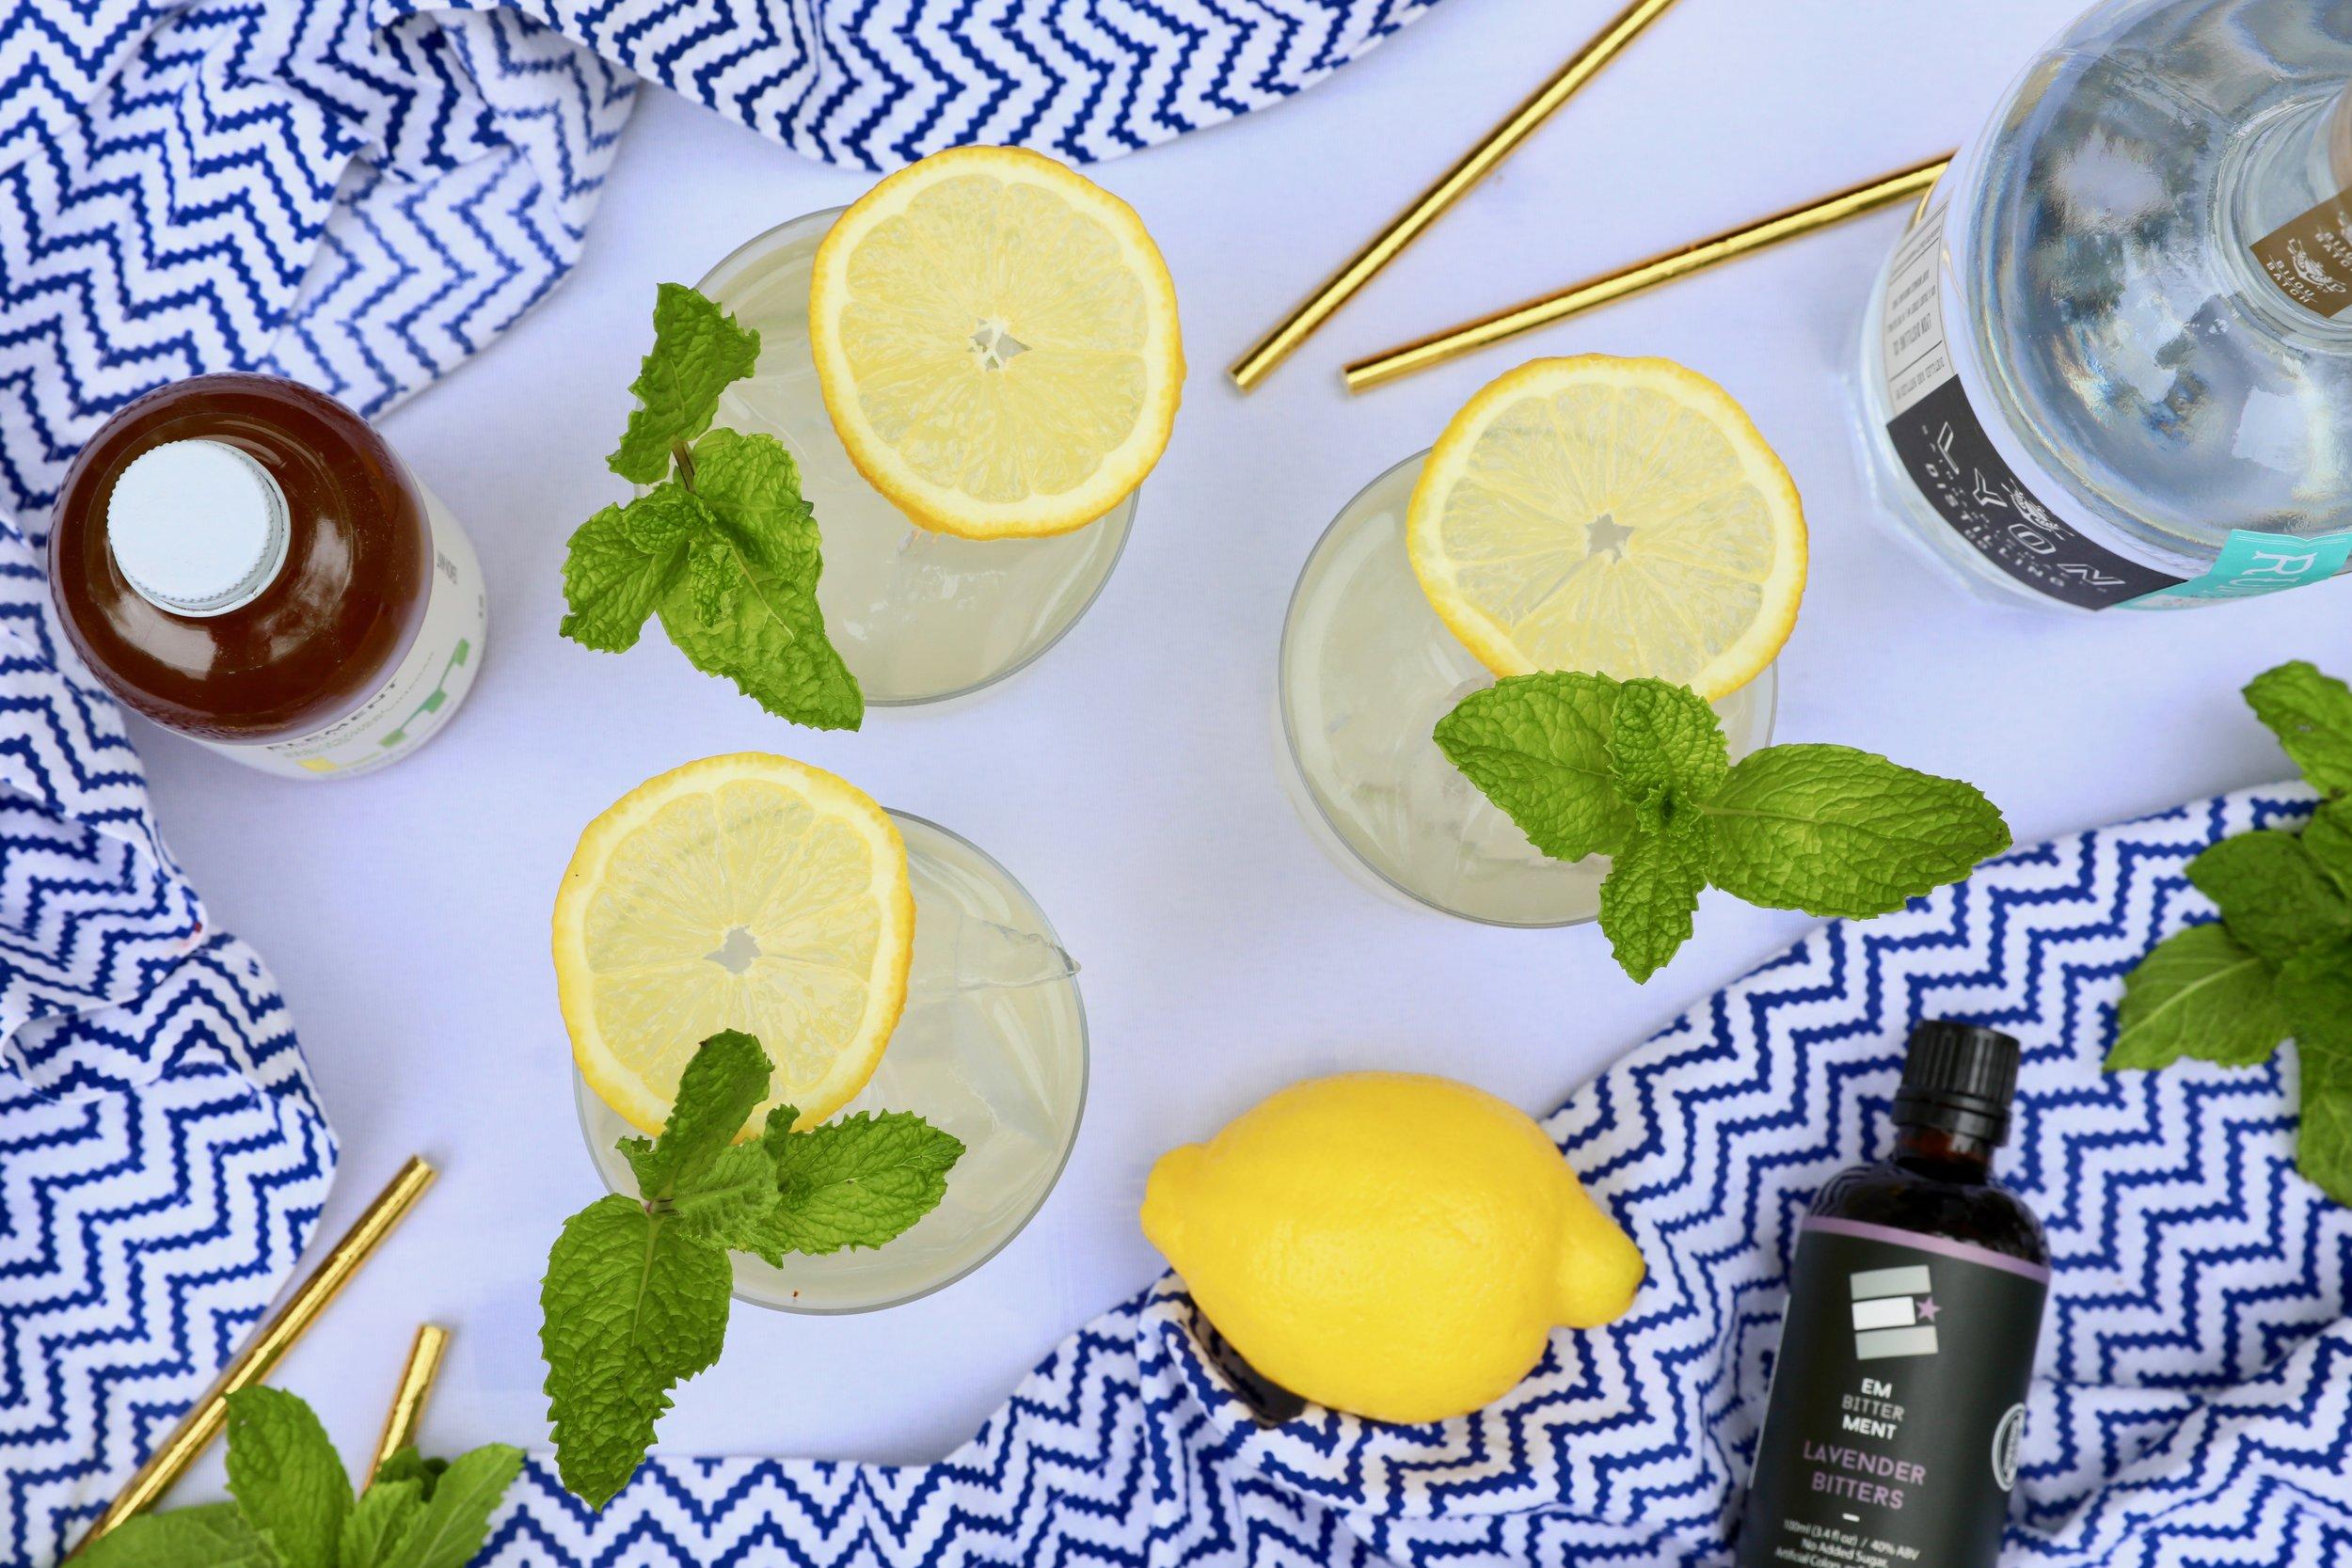 Element Mojito Lemon Mint Lavender 1.jpg